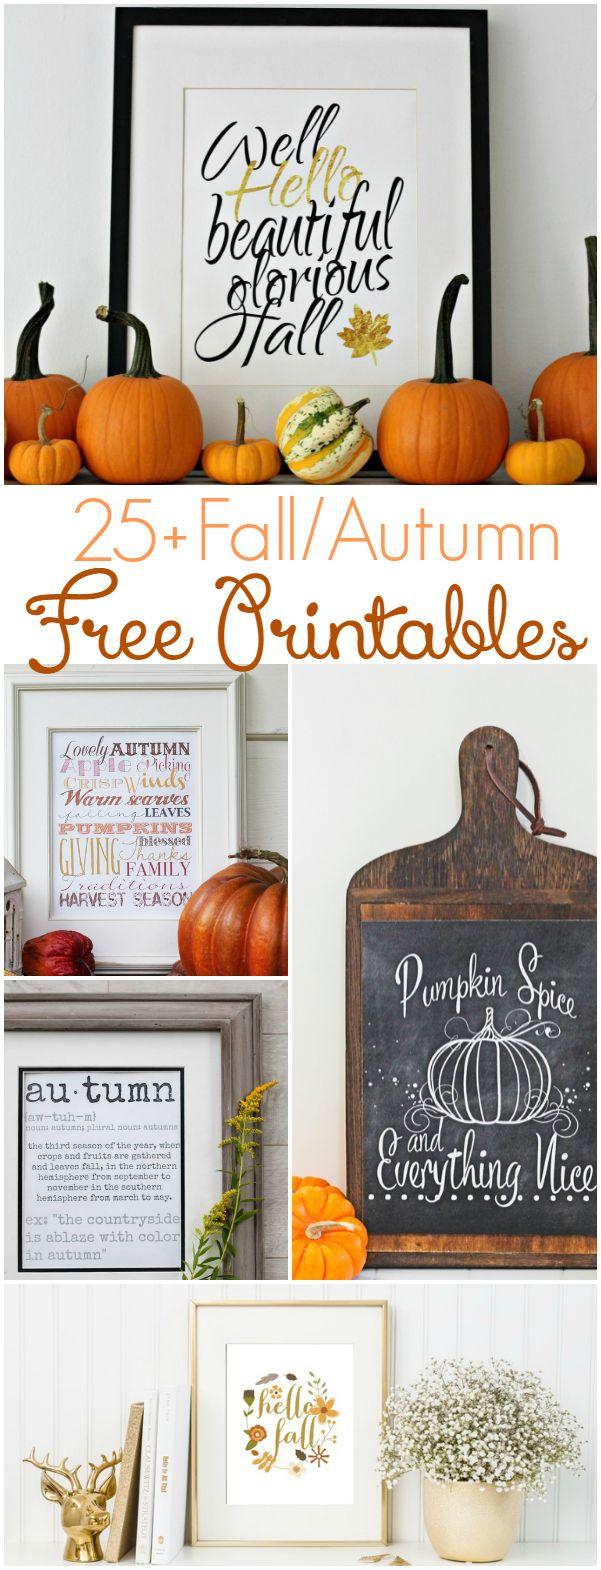 http://lollyjane.com/fall-free-printables/